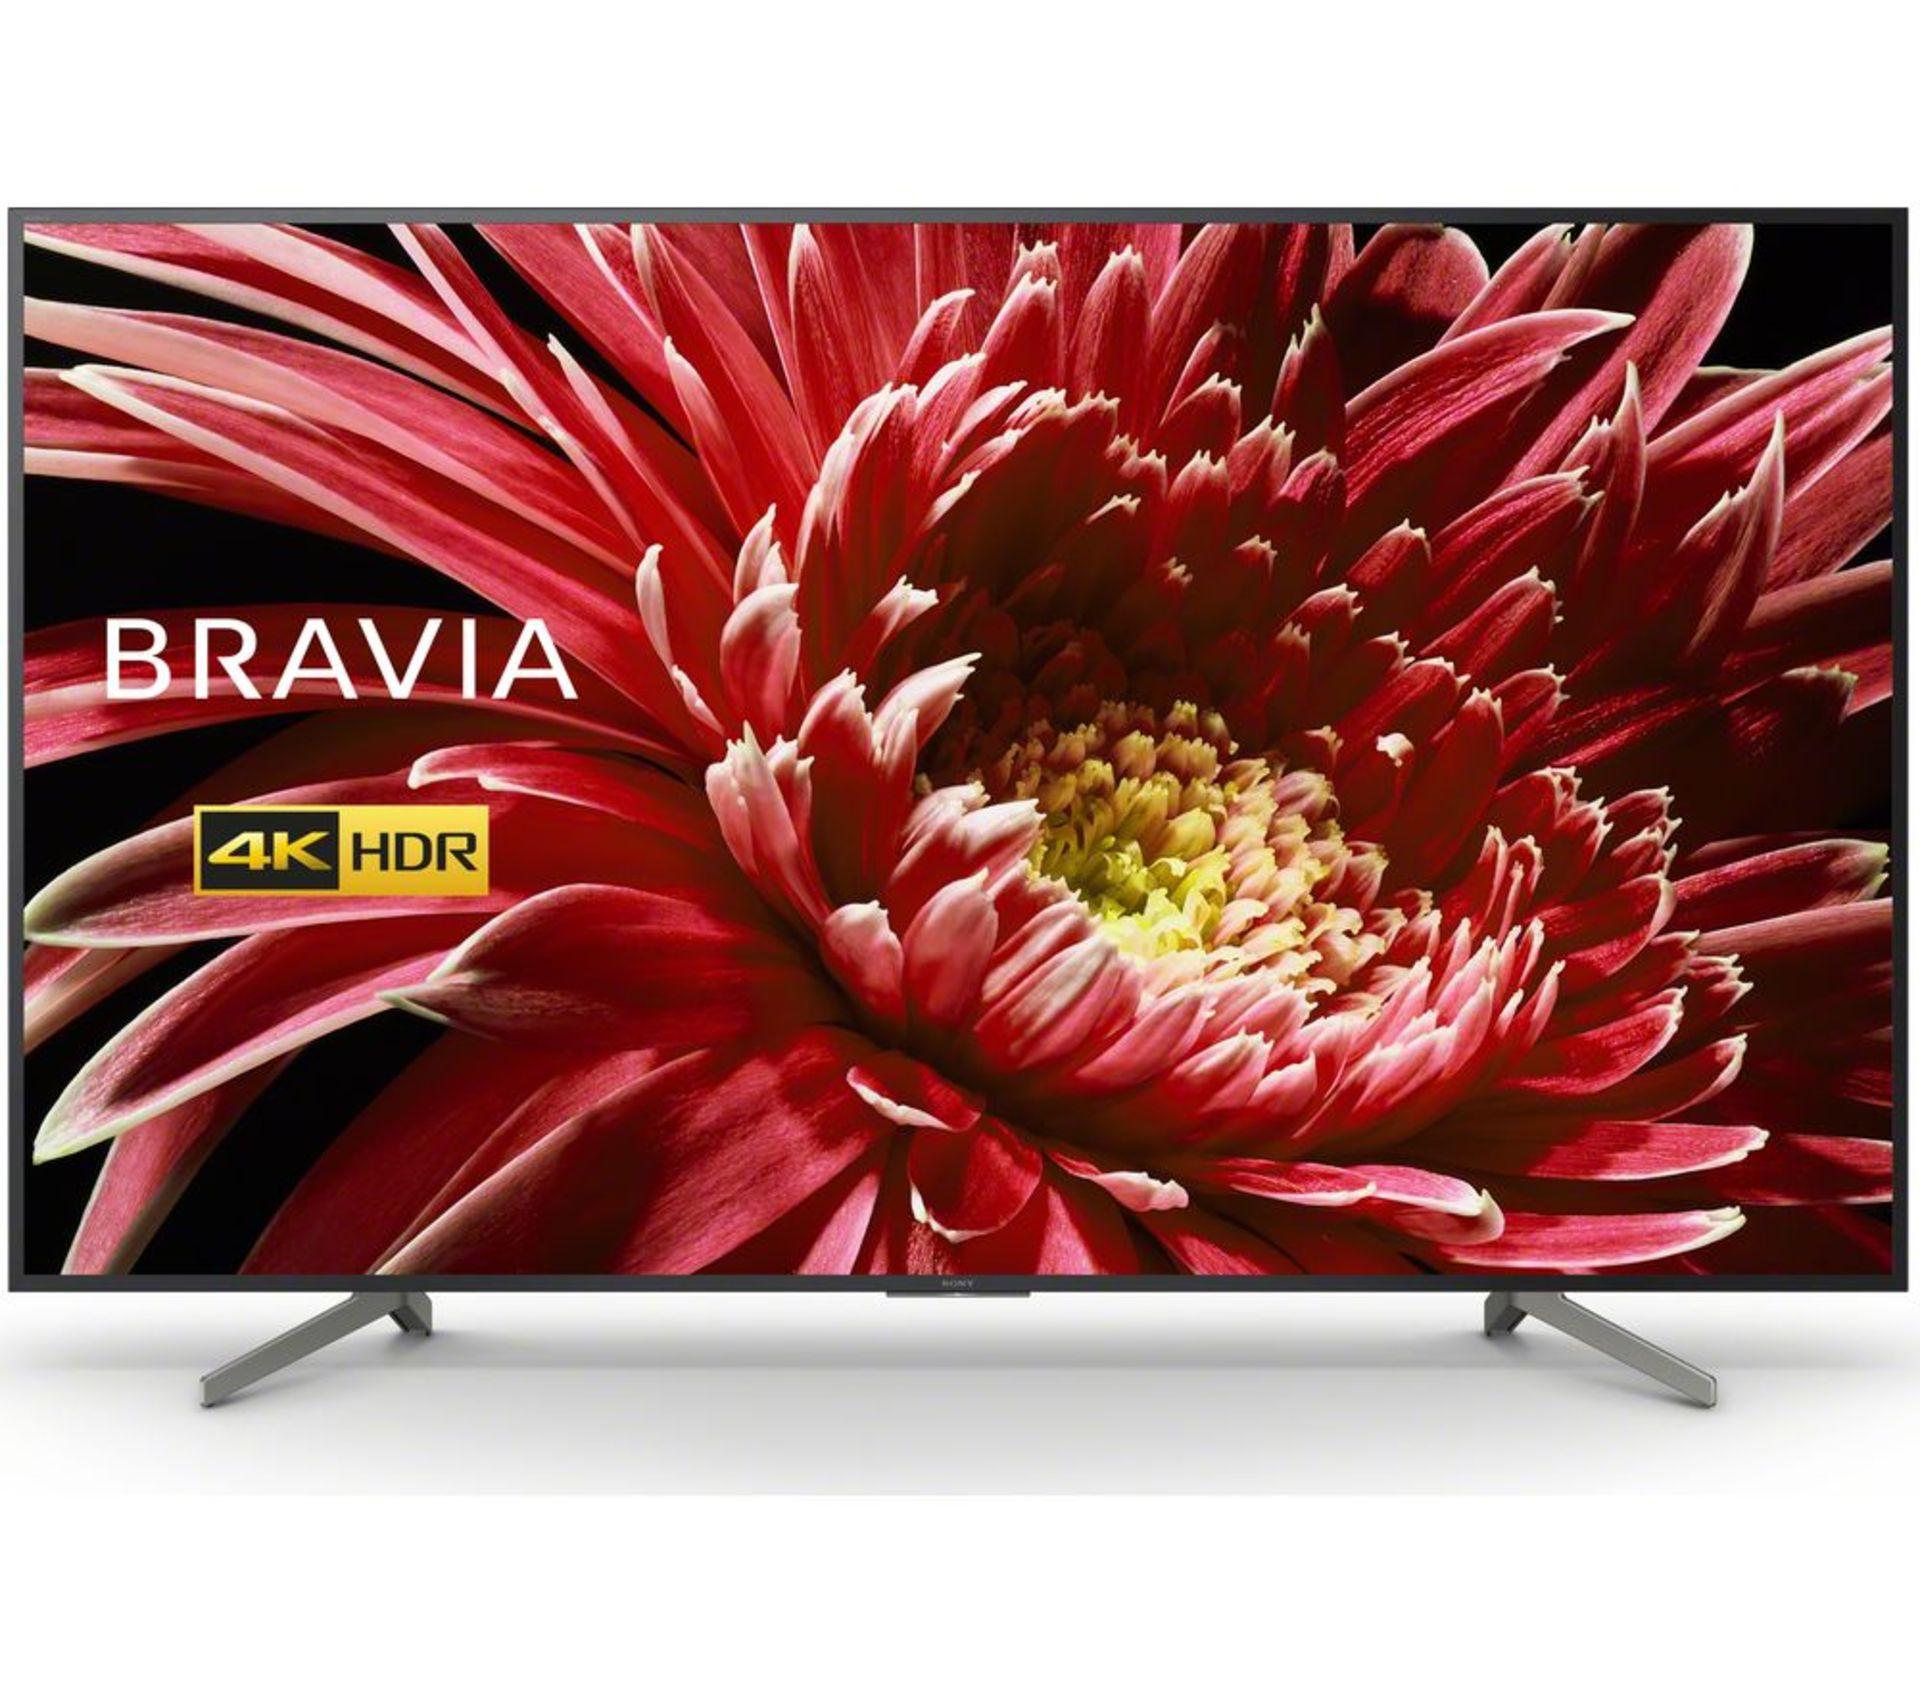 "Lot 60000 - V Brand New Sony Bravia 85"" 4K Ultra HD Smart LED TV - 4K Ultra HD 3840 x 2160p - Triluminos Display"